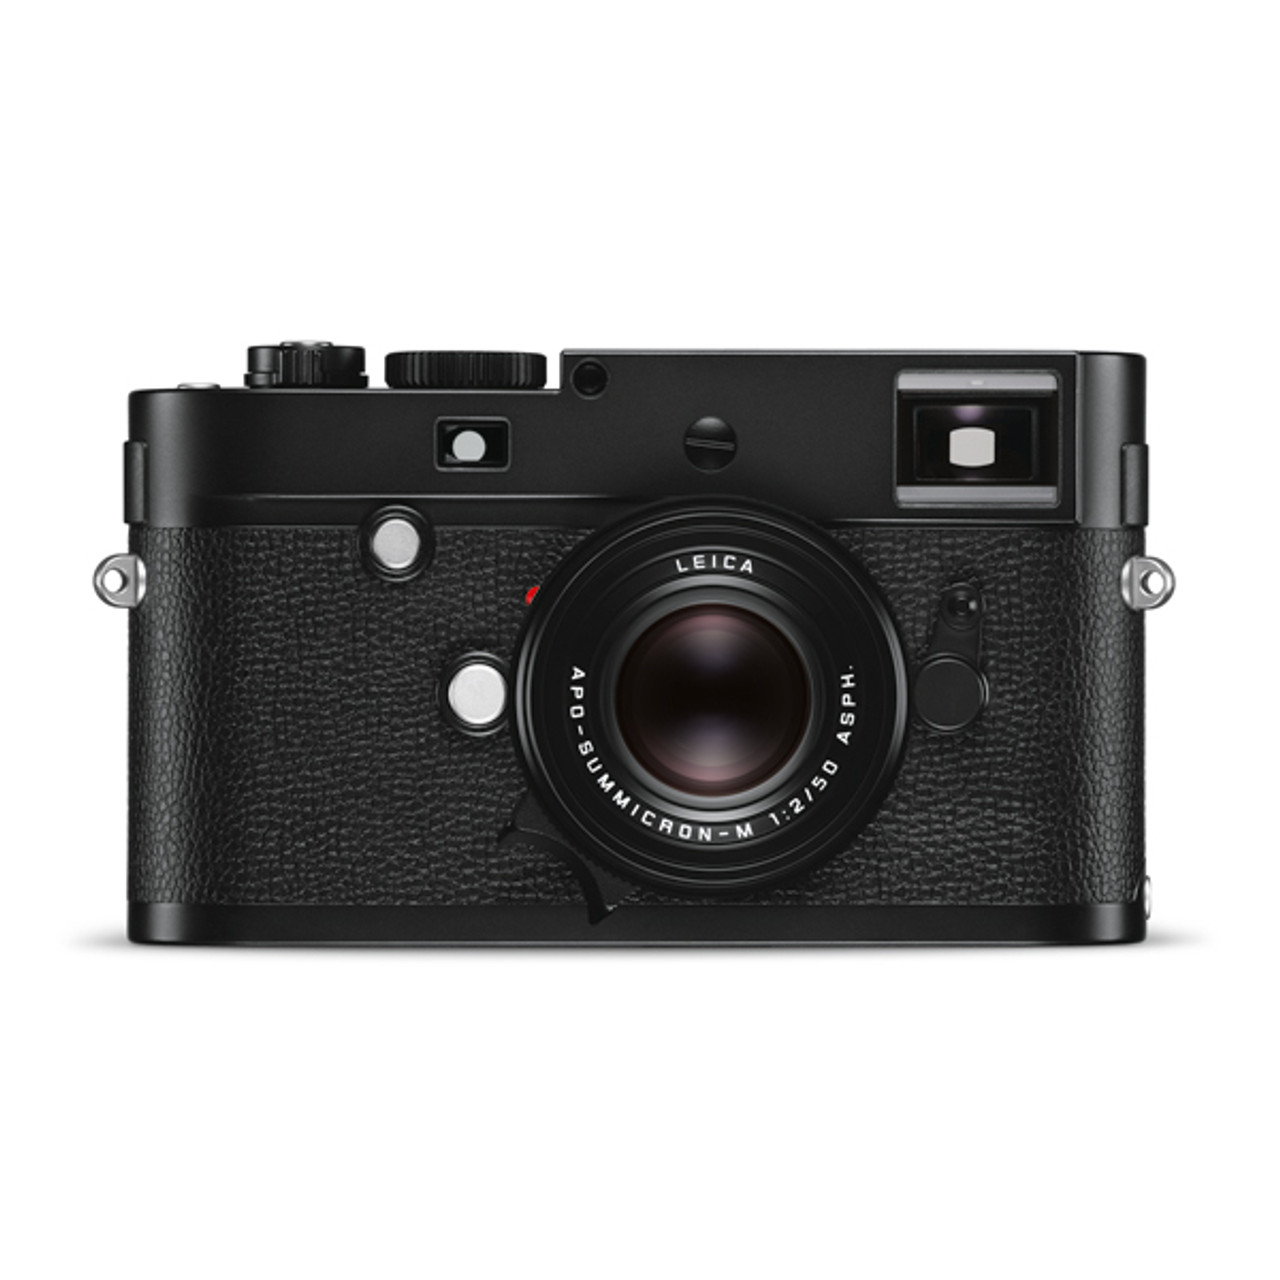 Leica M Monochrom Typ246 Body Black